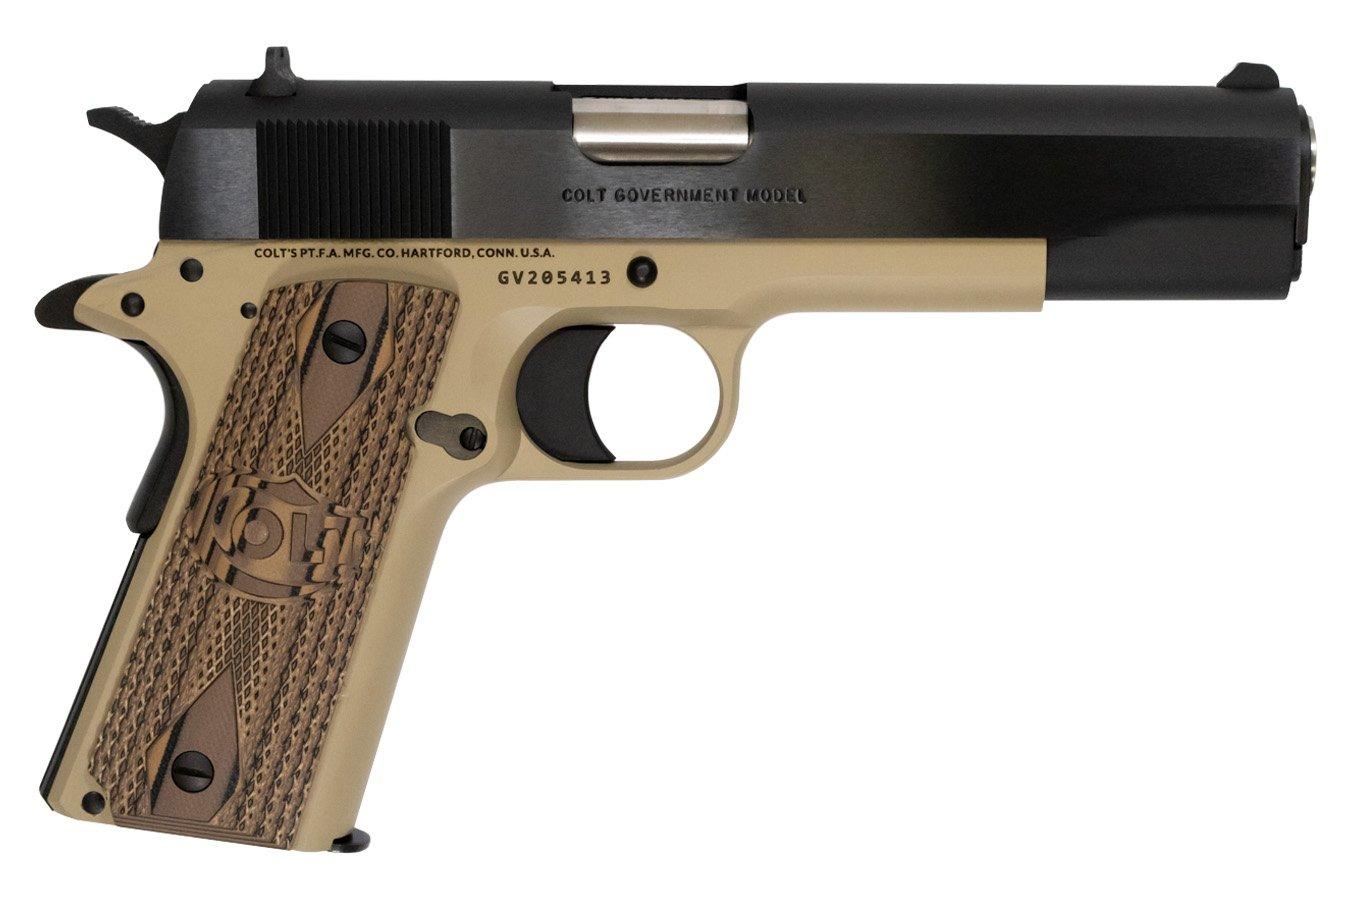 Colt 1991 45 ACP 5